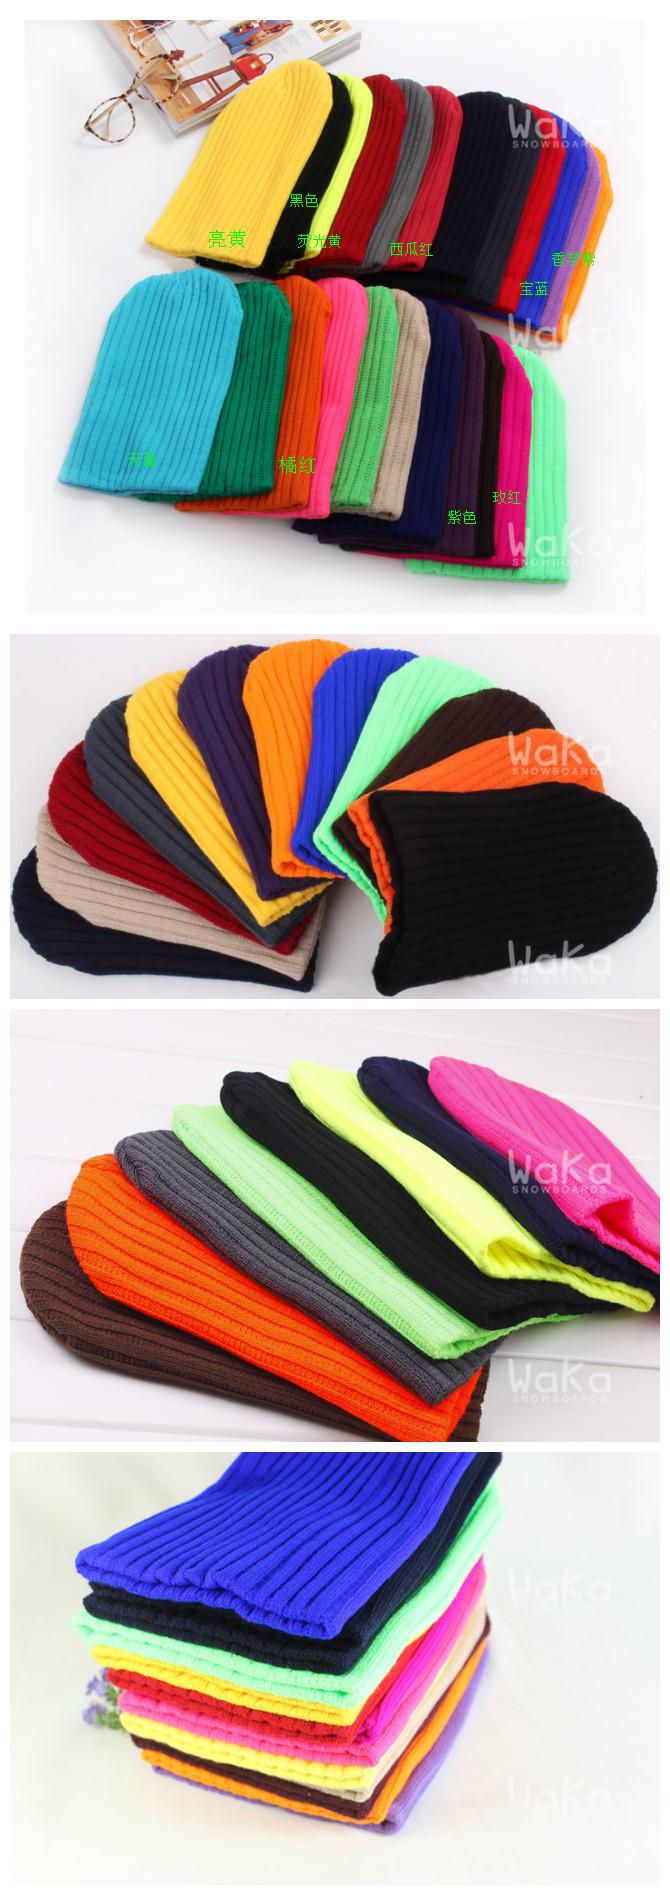 зимняя теплая лыжная шапка, горнолыжная шапка фото